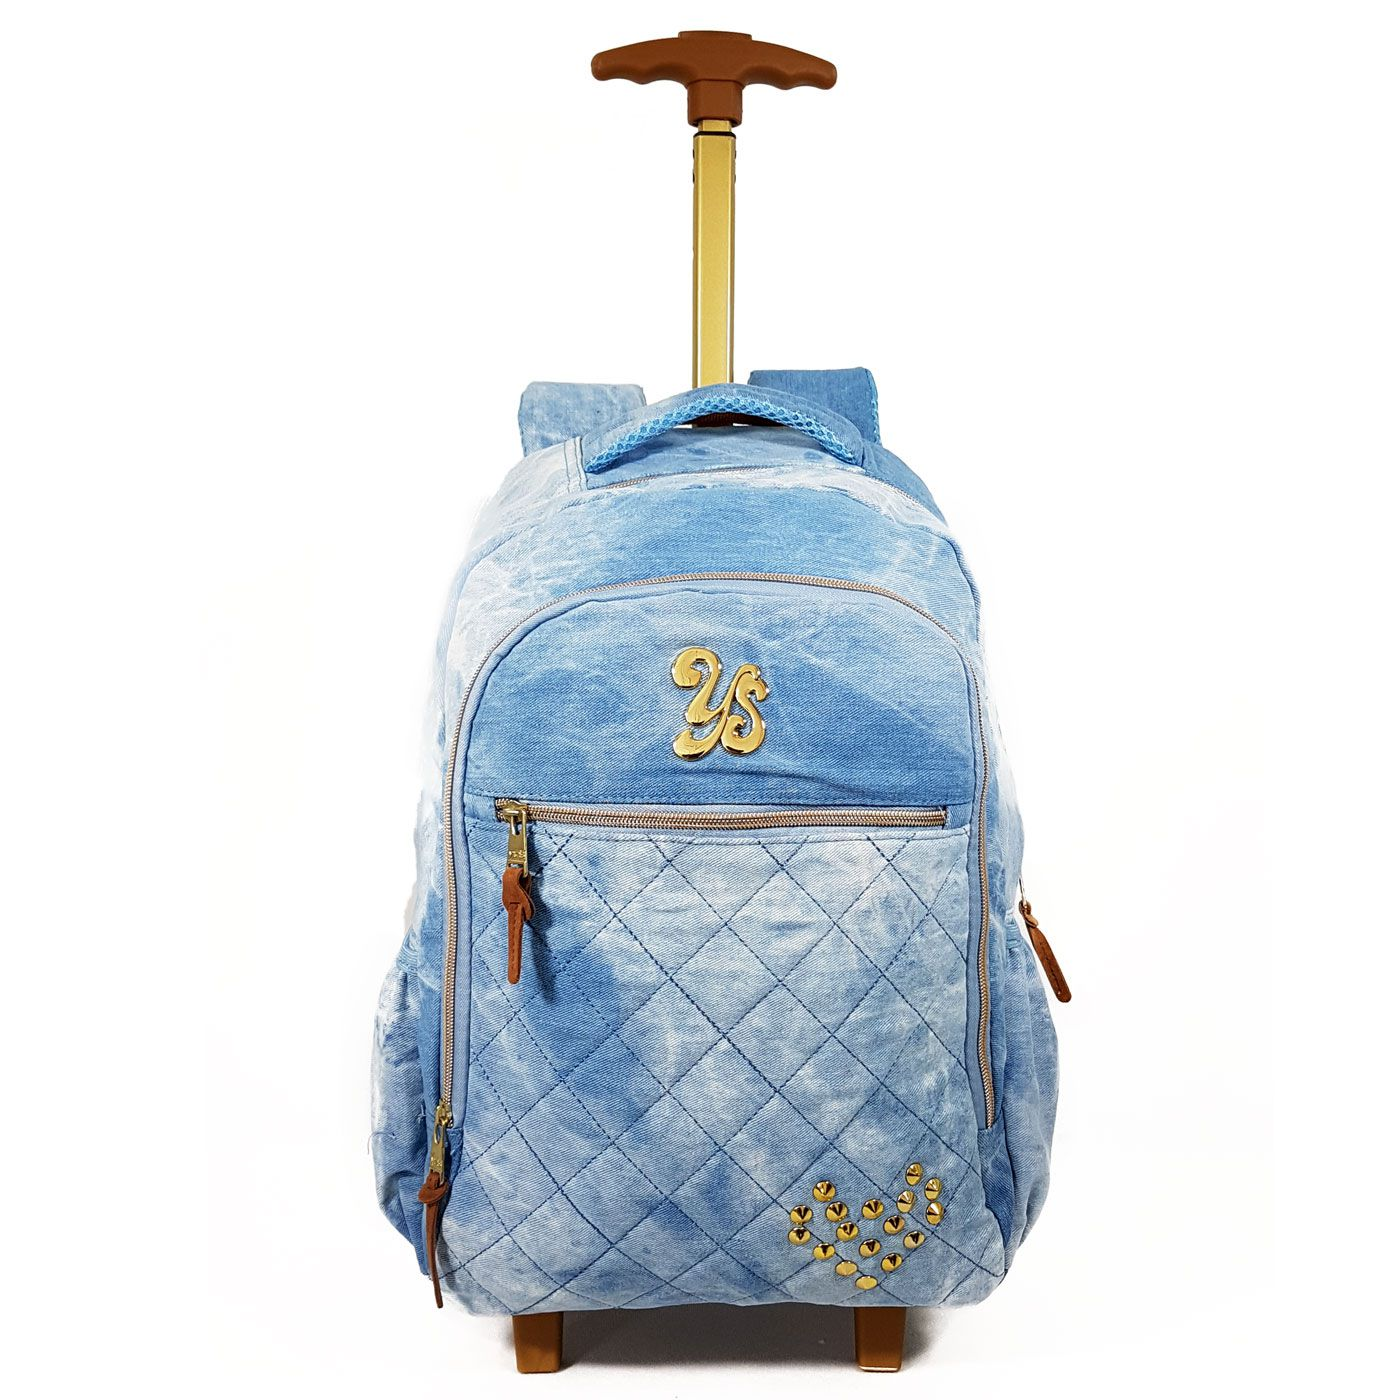 f4a451276 MOCHILA DE CARRINHO JEANS FEMININA YS SEANITE - MJ14025 - Classe Bag